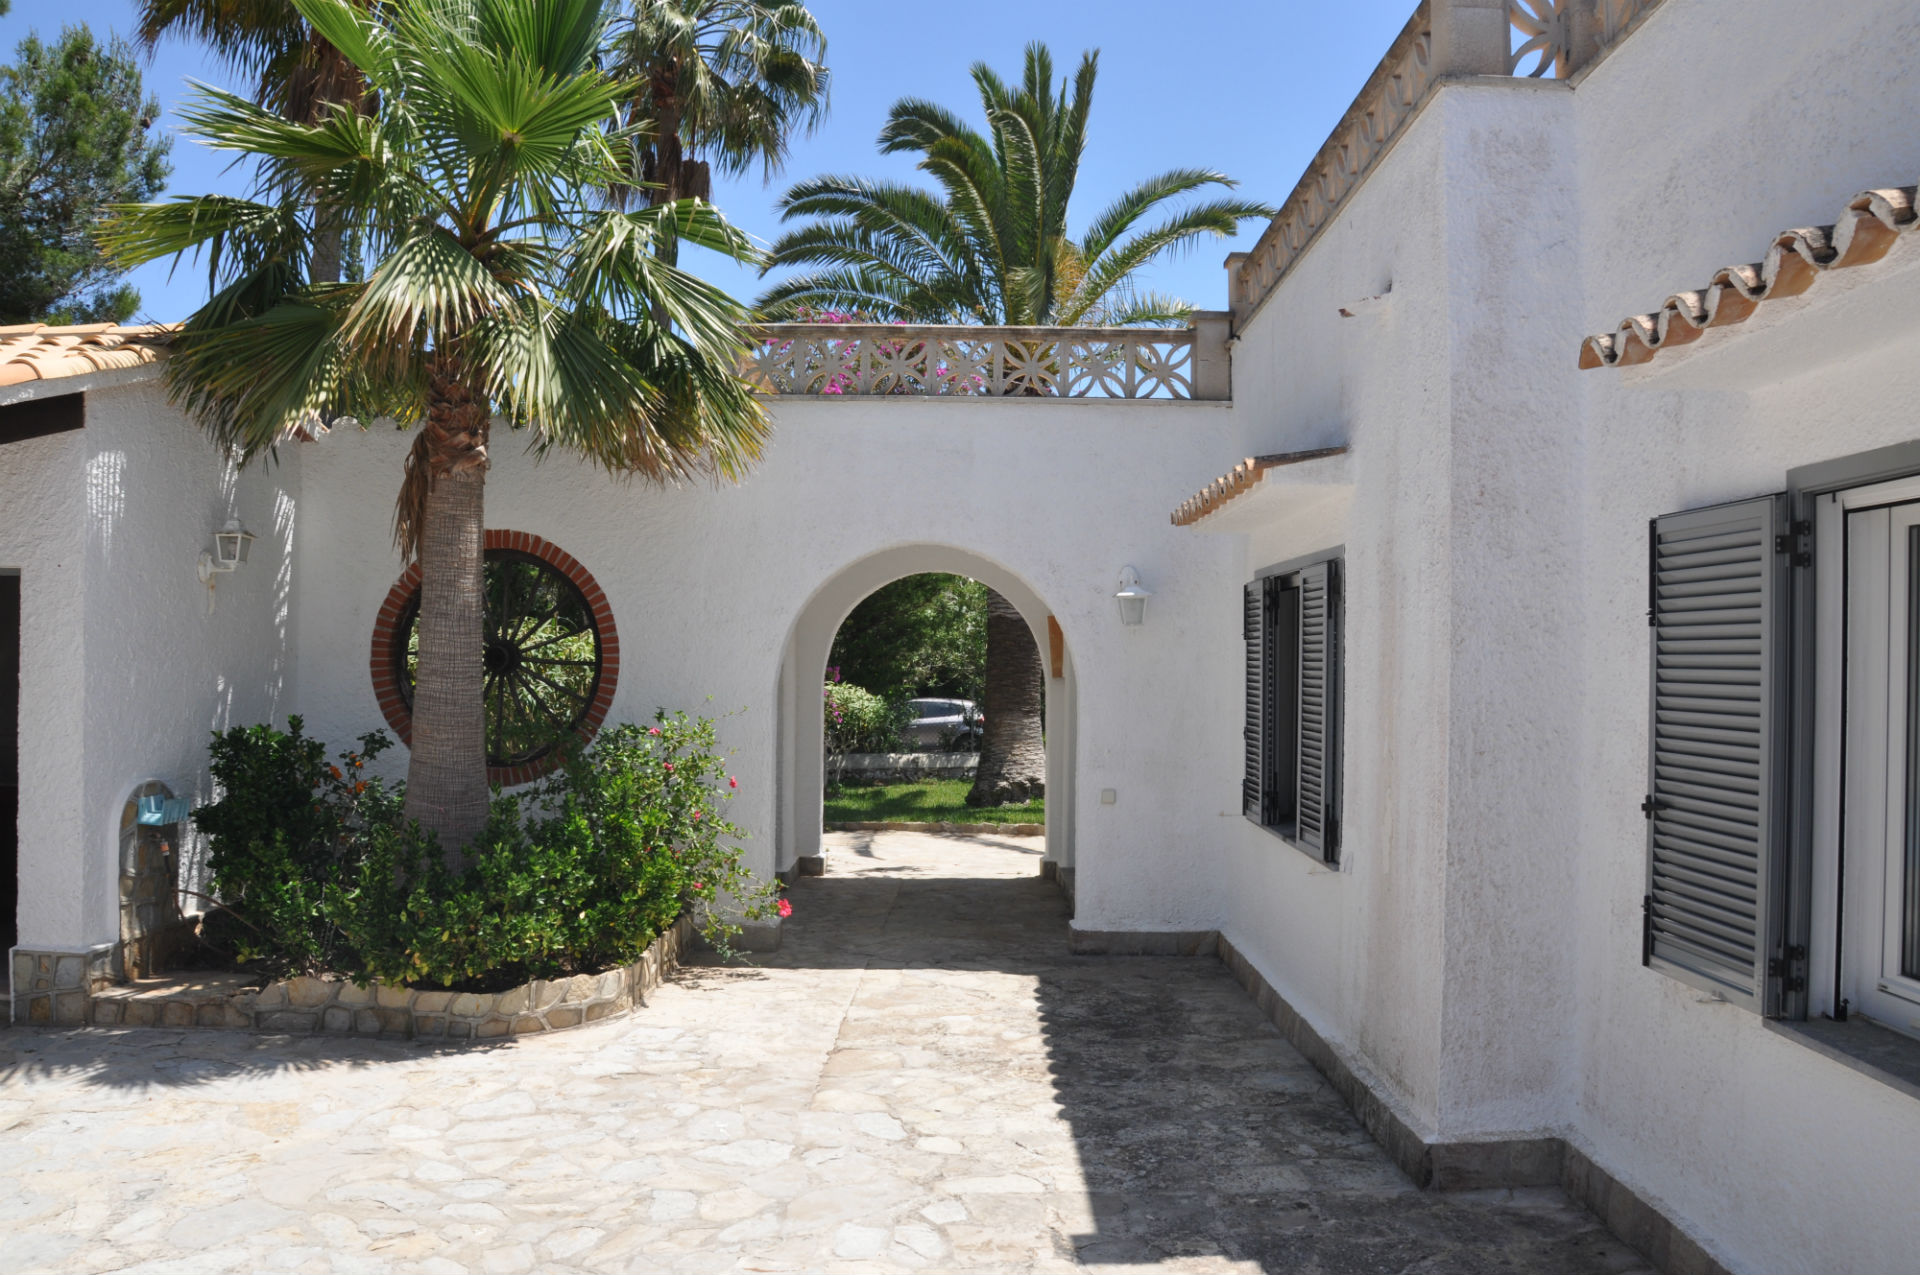 59 Villa Juliette